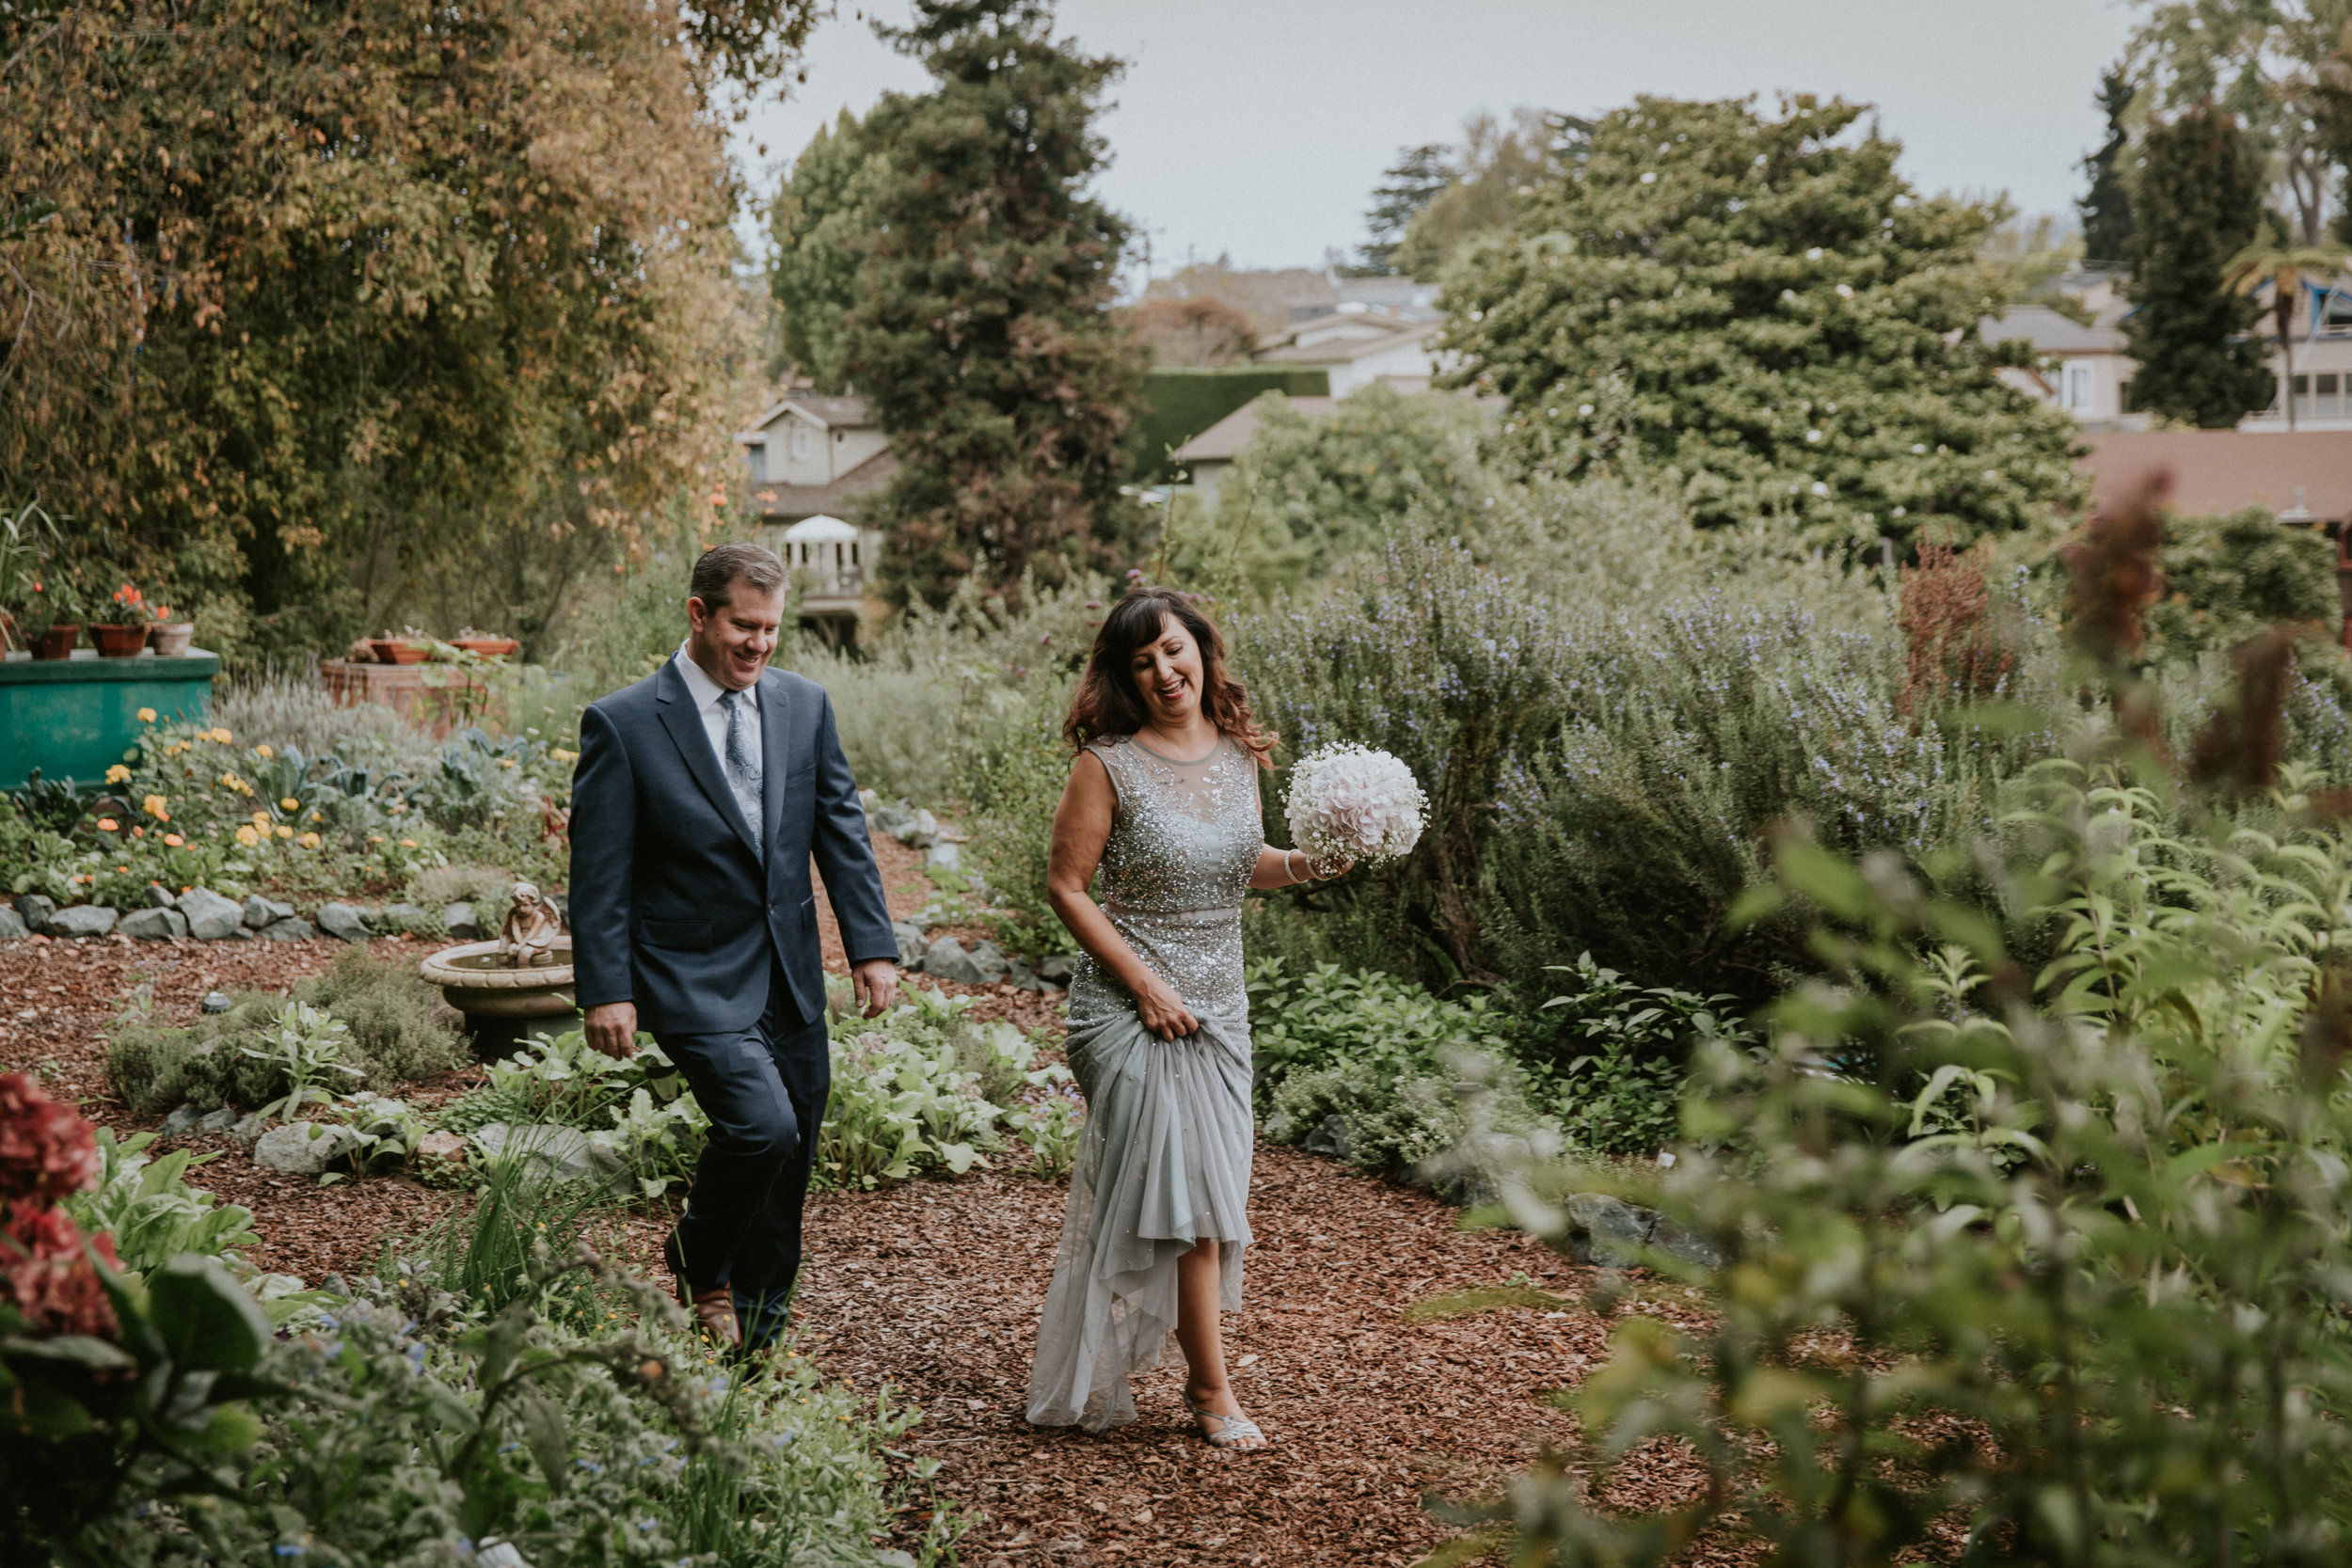 Capitola-Santa-Cruz-wedding-photographer-104.jpg